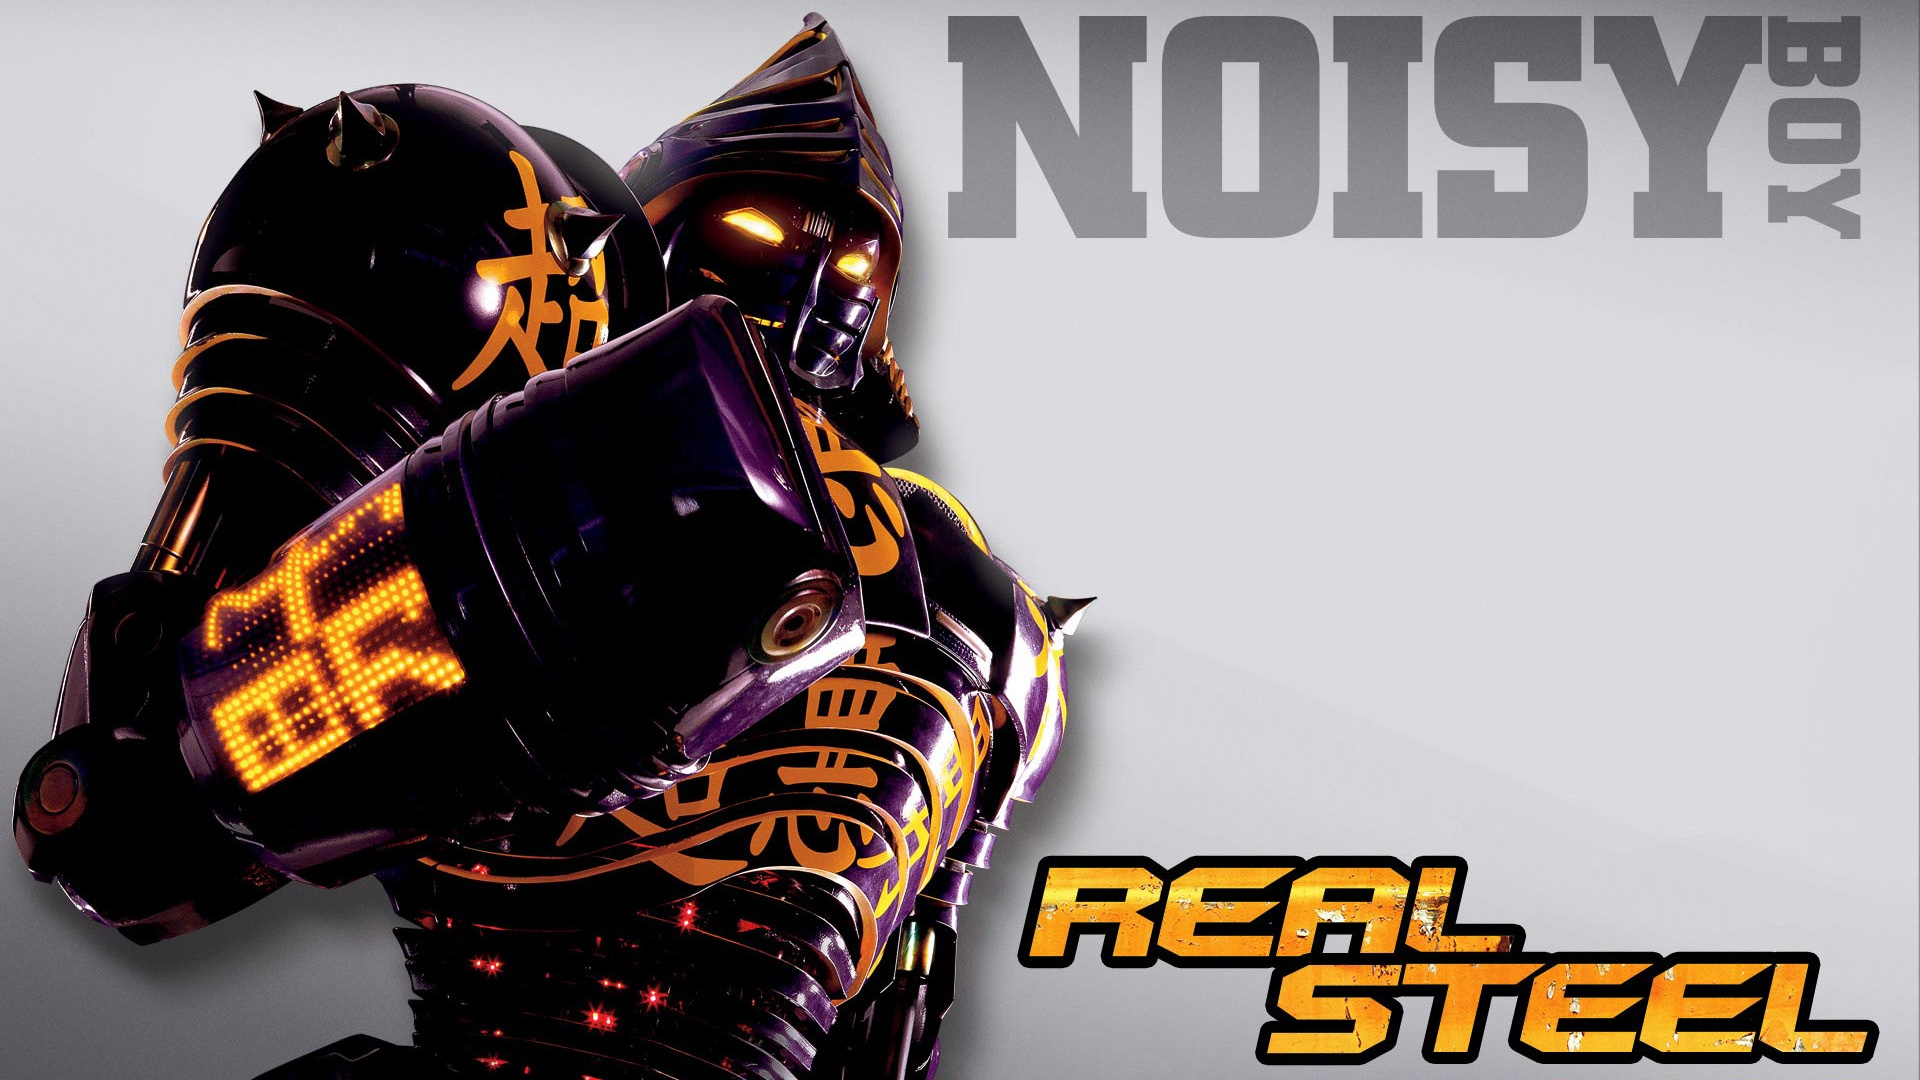 Noisy Boy In Real Steel Wallpapers In Jpg Format For Free Download